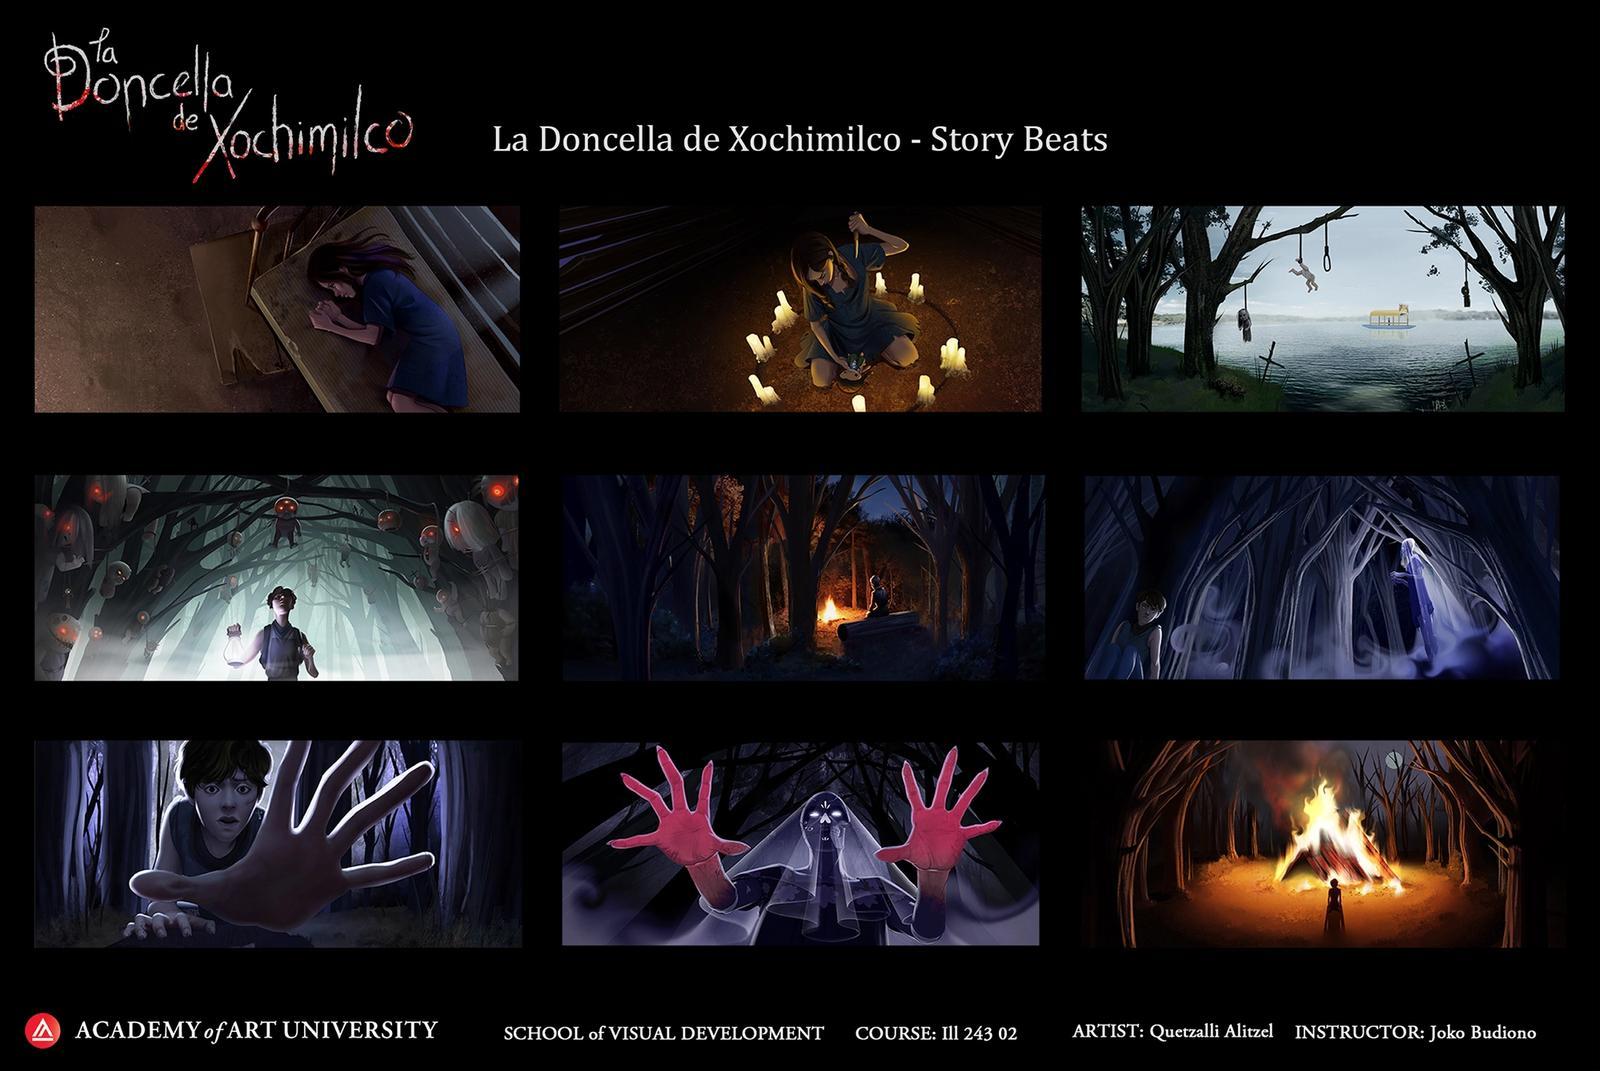 La Doncella de Xochimilco Story Beats - Quetzalli Alizel Maldonado Osorio